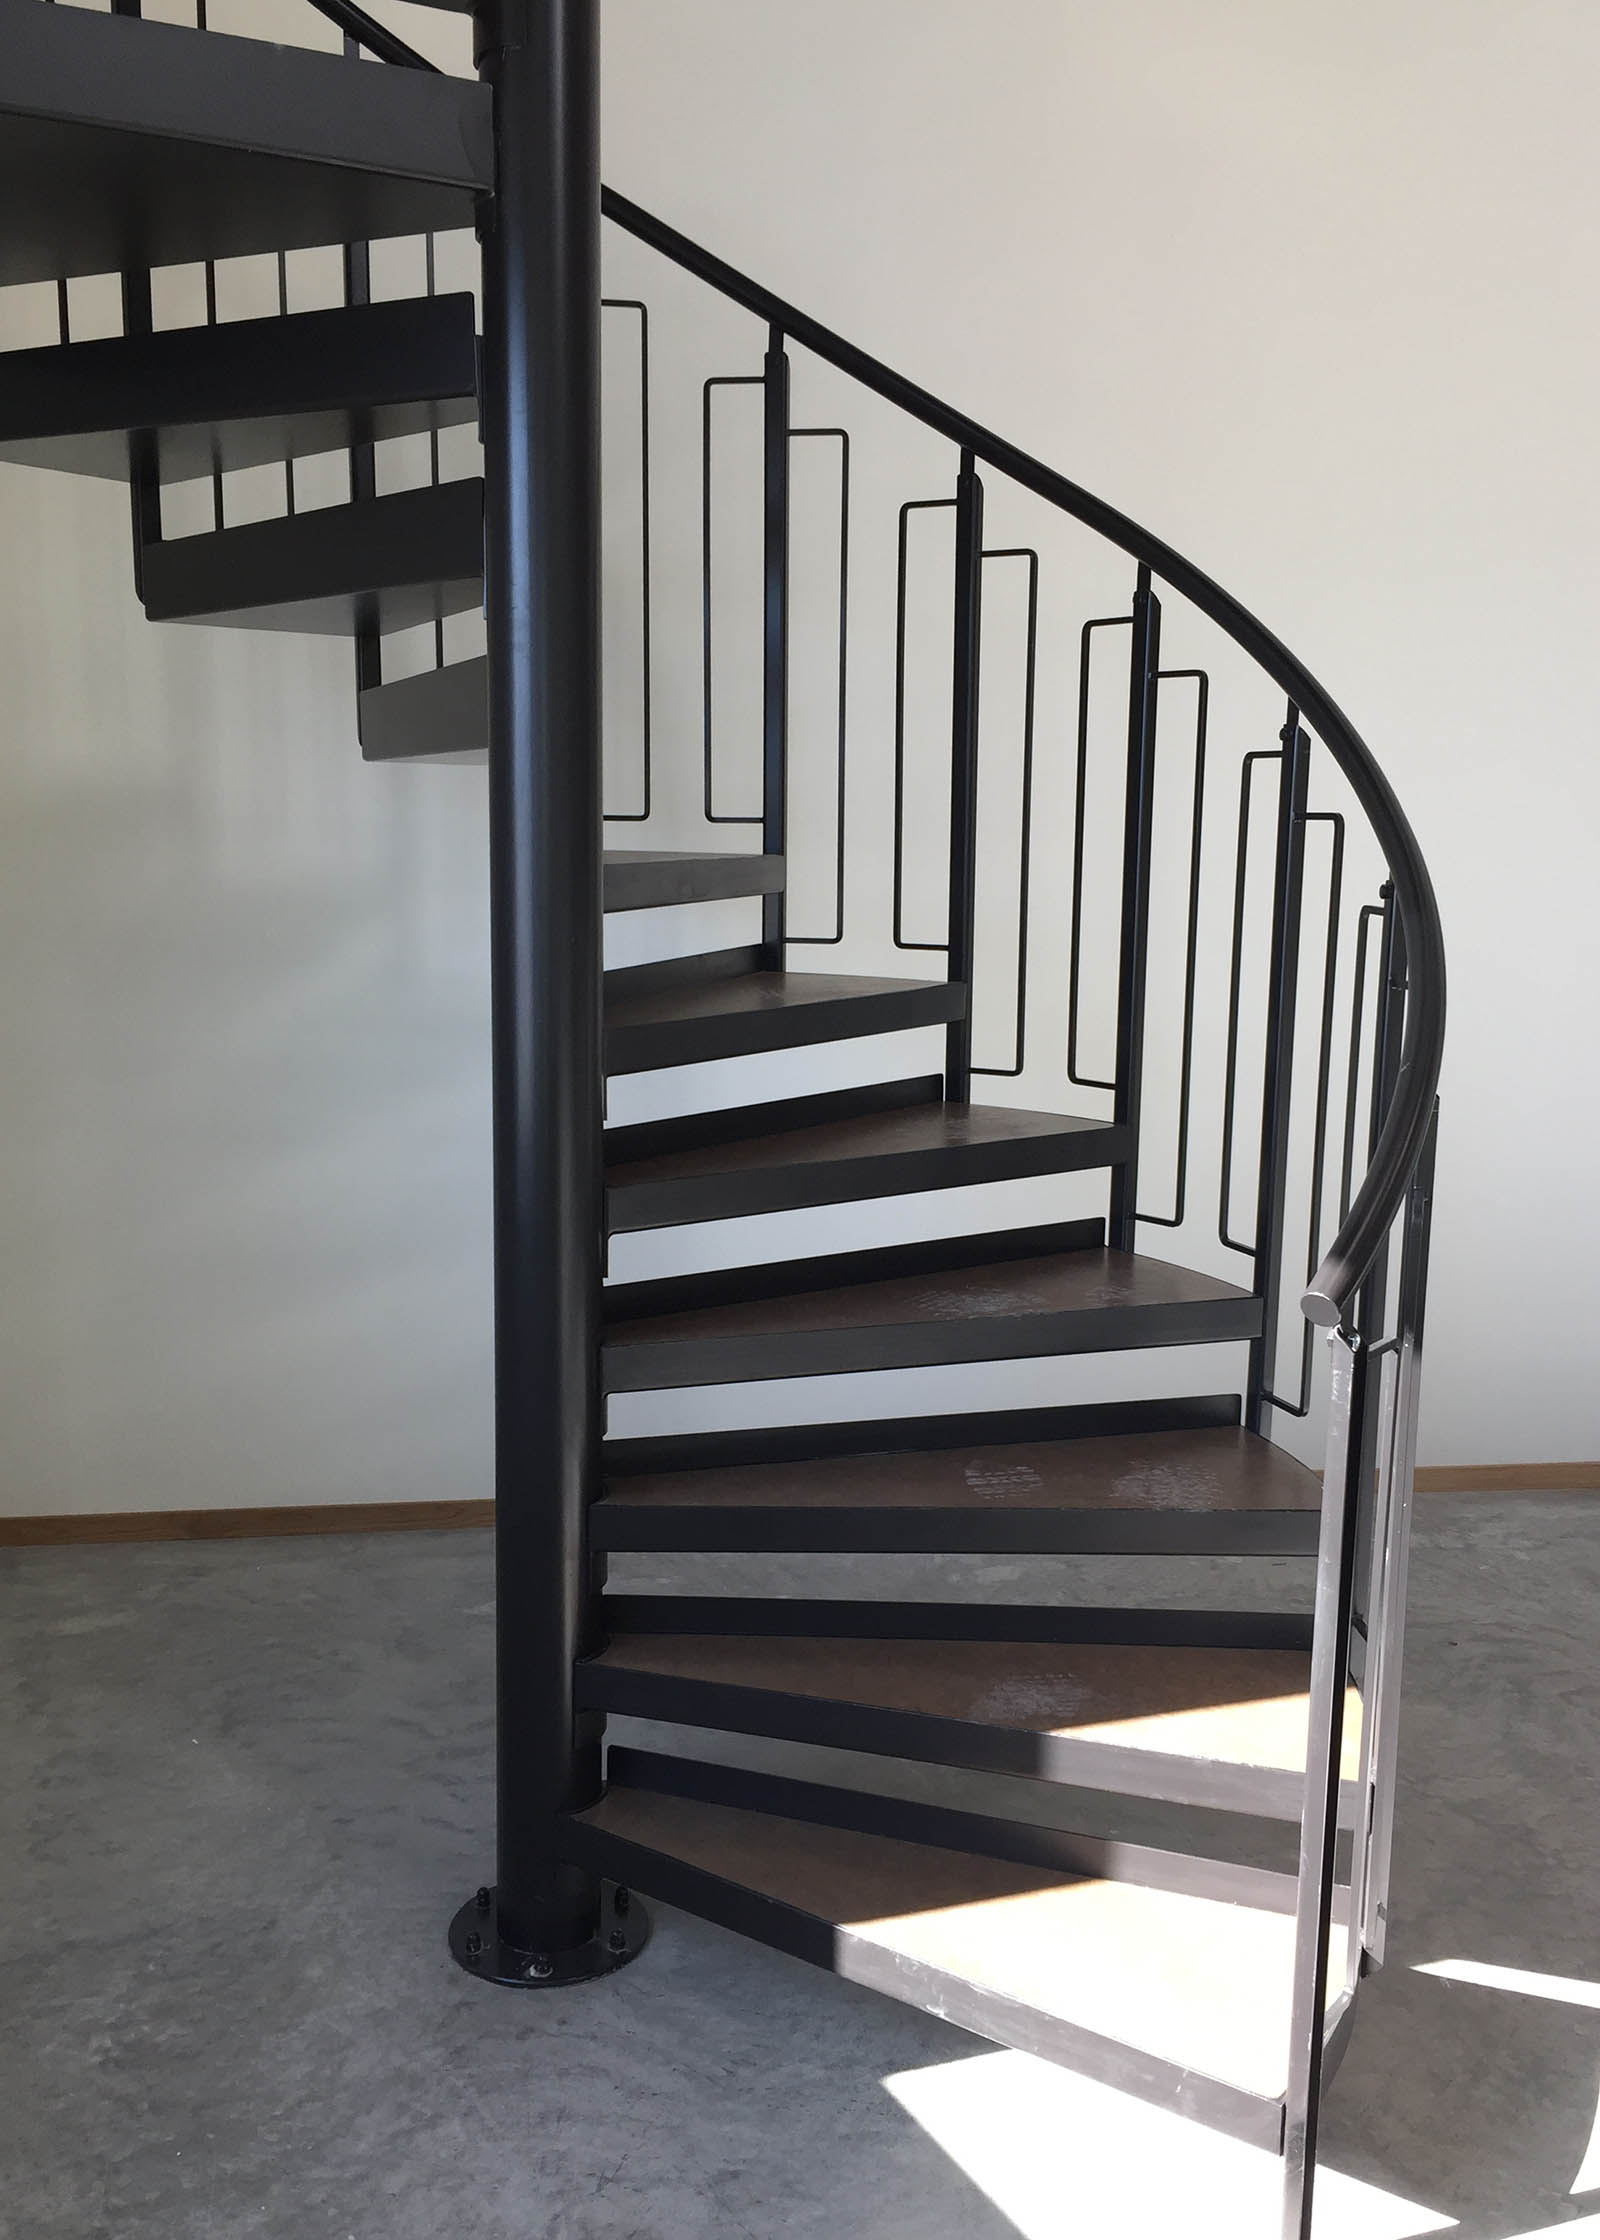 Indistriell spiraltrapp i stål